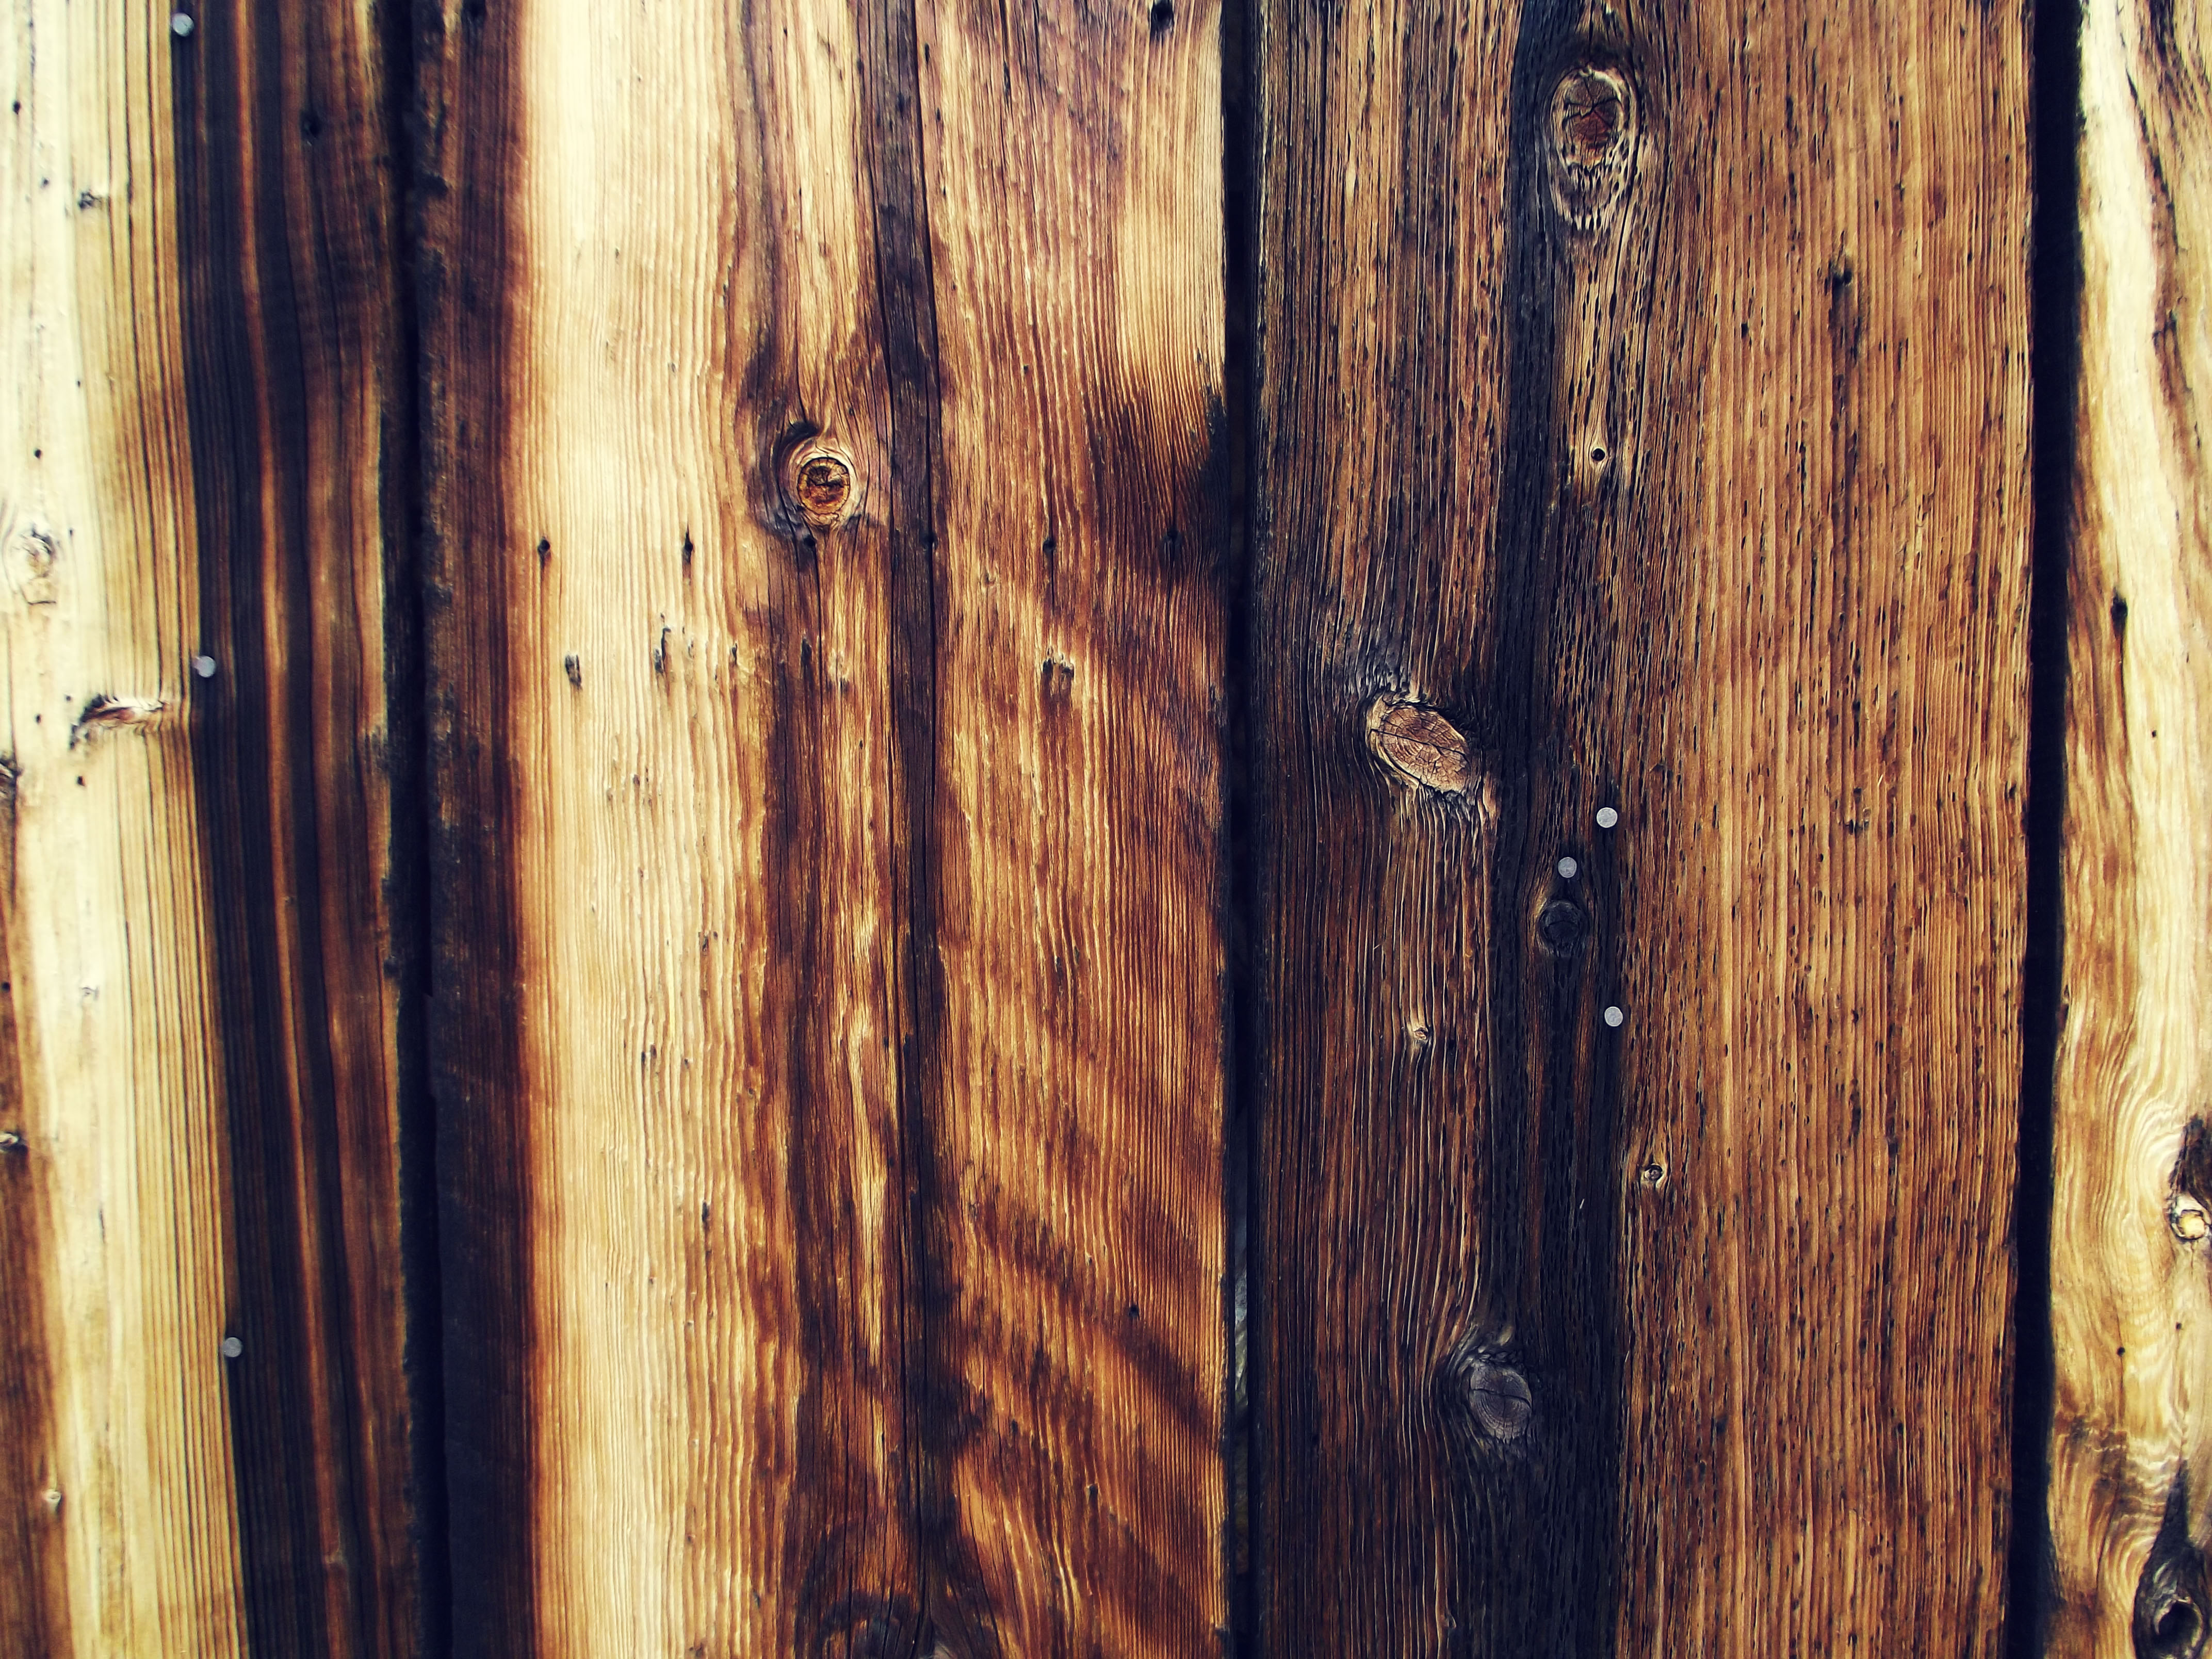 Weathered barn wood wallpaper wallpapersafari for Buy old barn wood